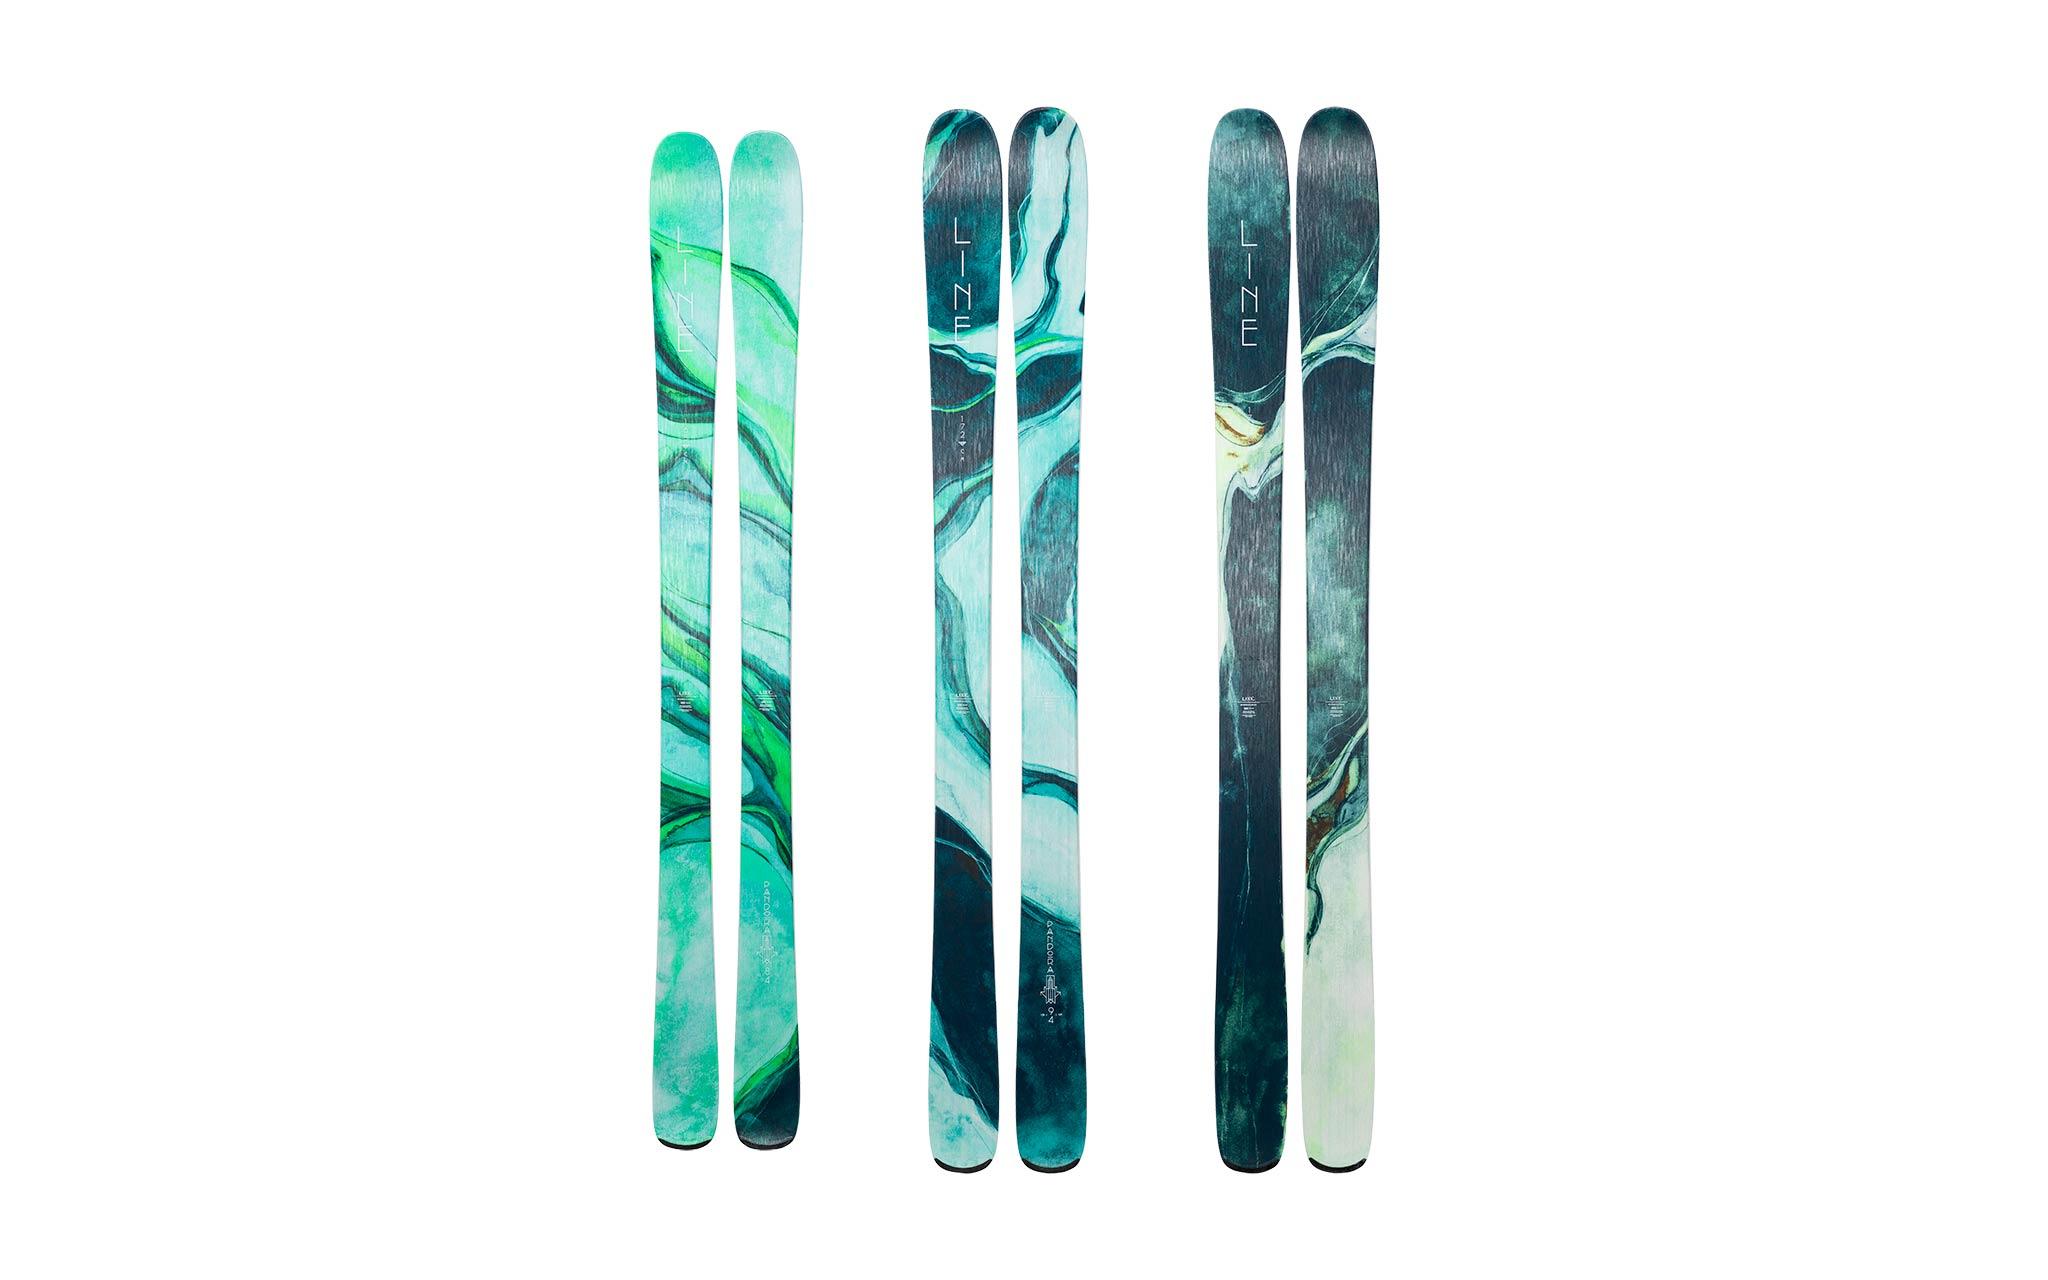 Line Ski Pandora Line 18/19 - 84 / 94 / 104 (v.l.n.r.)